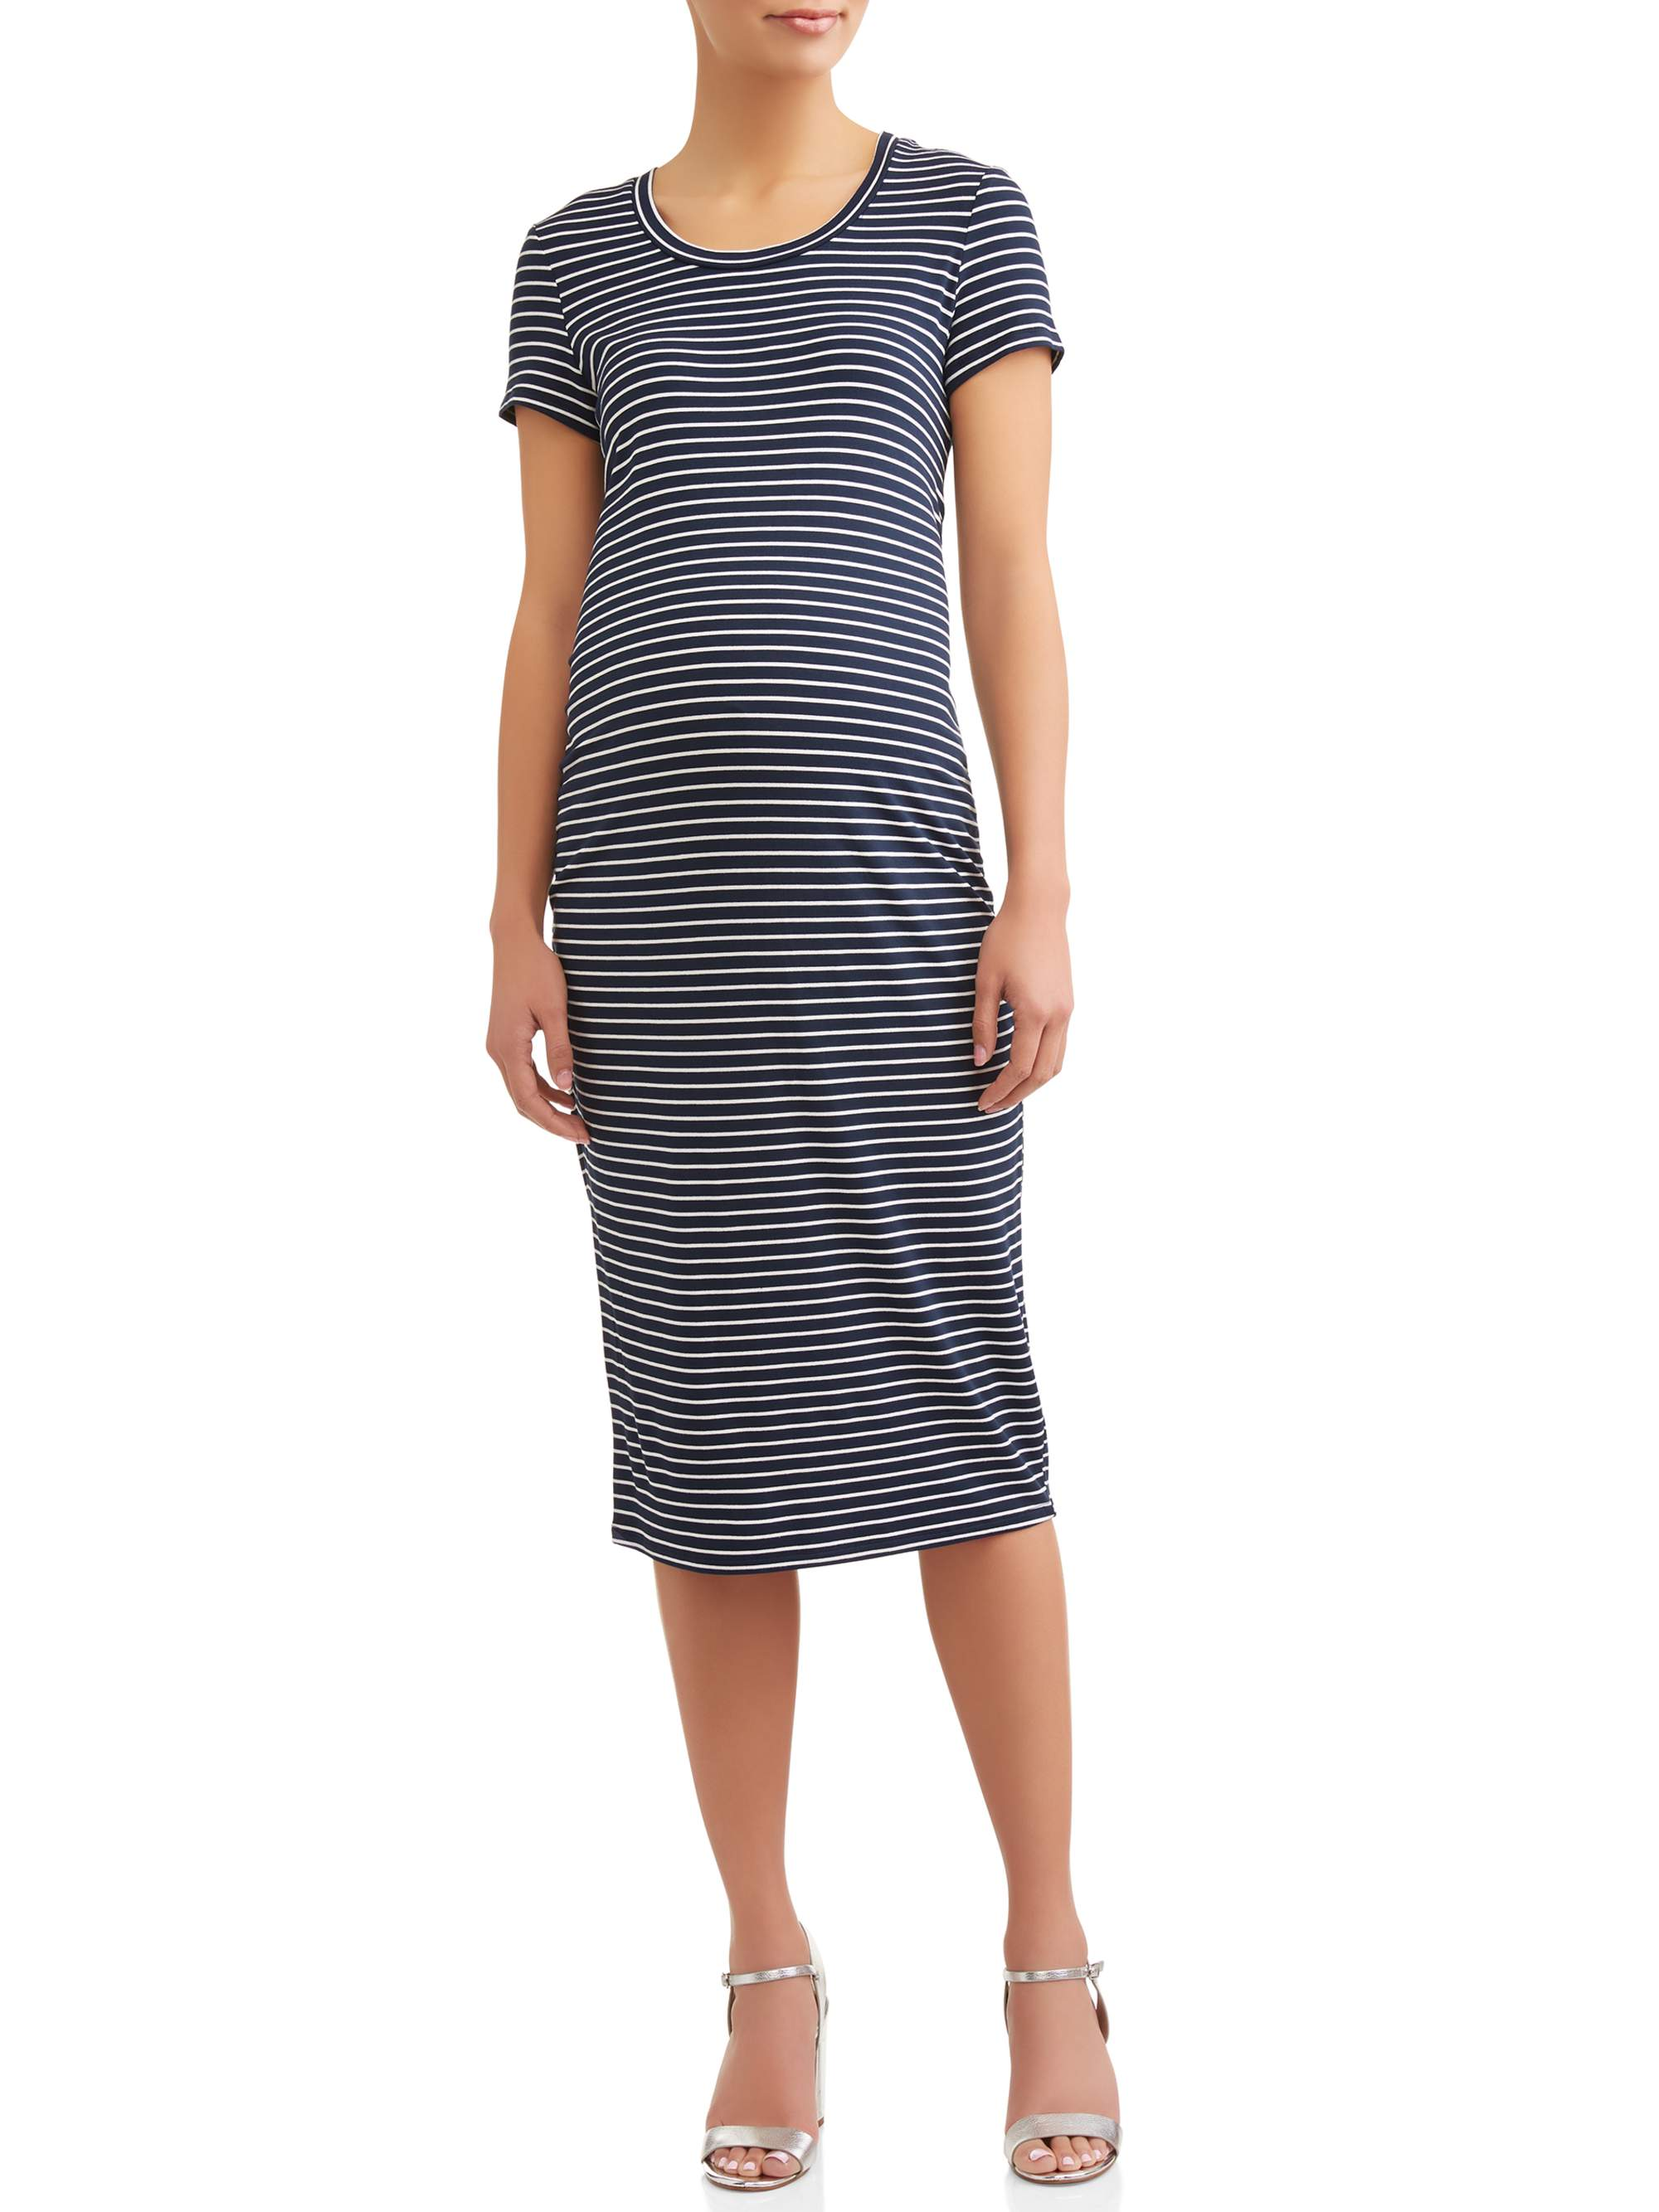 4eacc97986b4e Maternity Short Sleeve Dress - Walmart.com